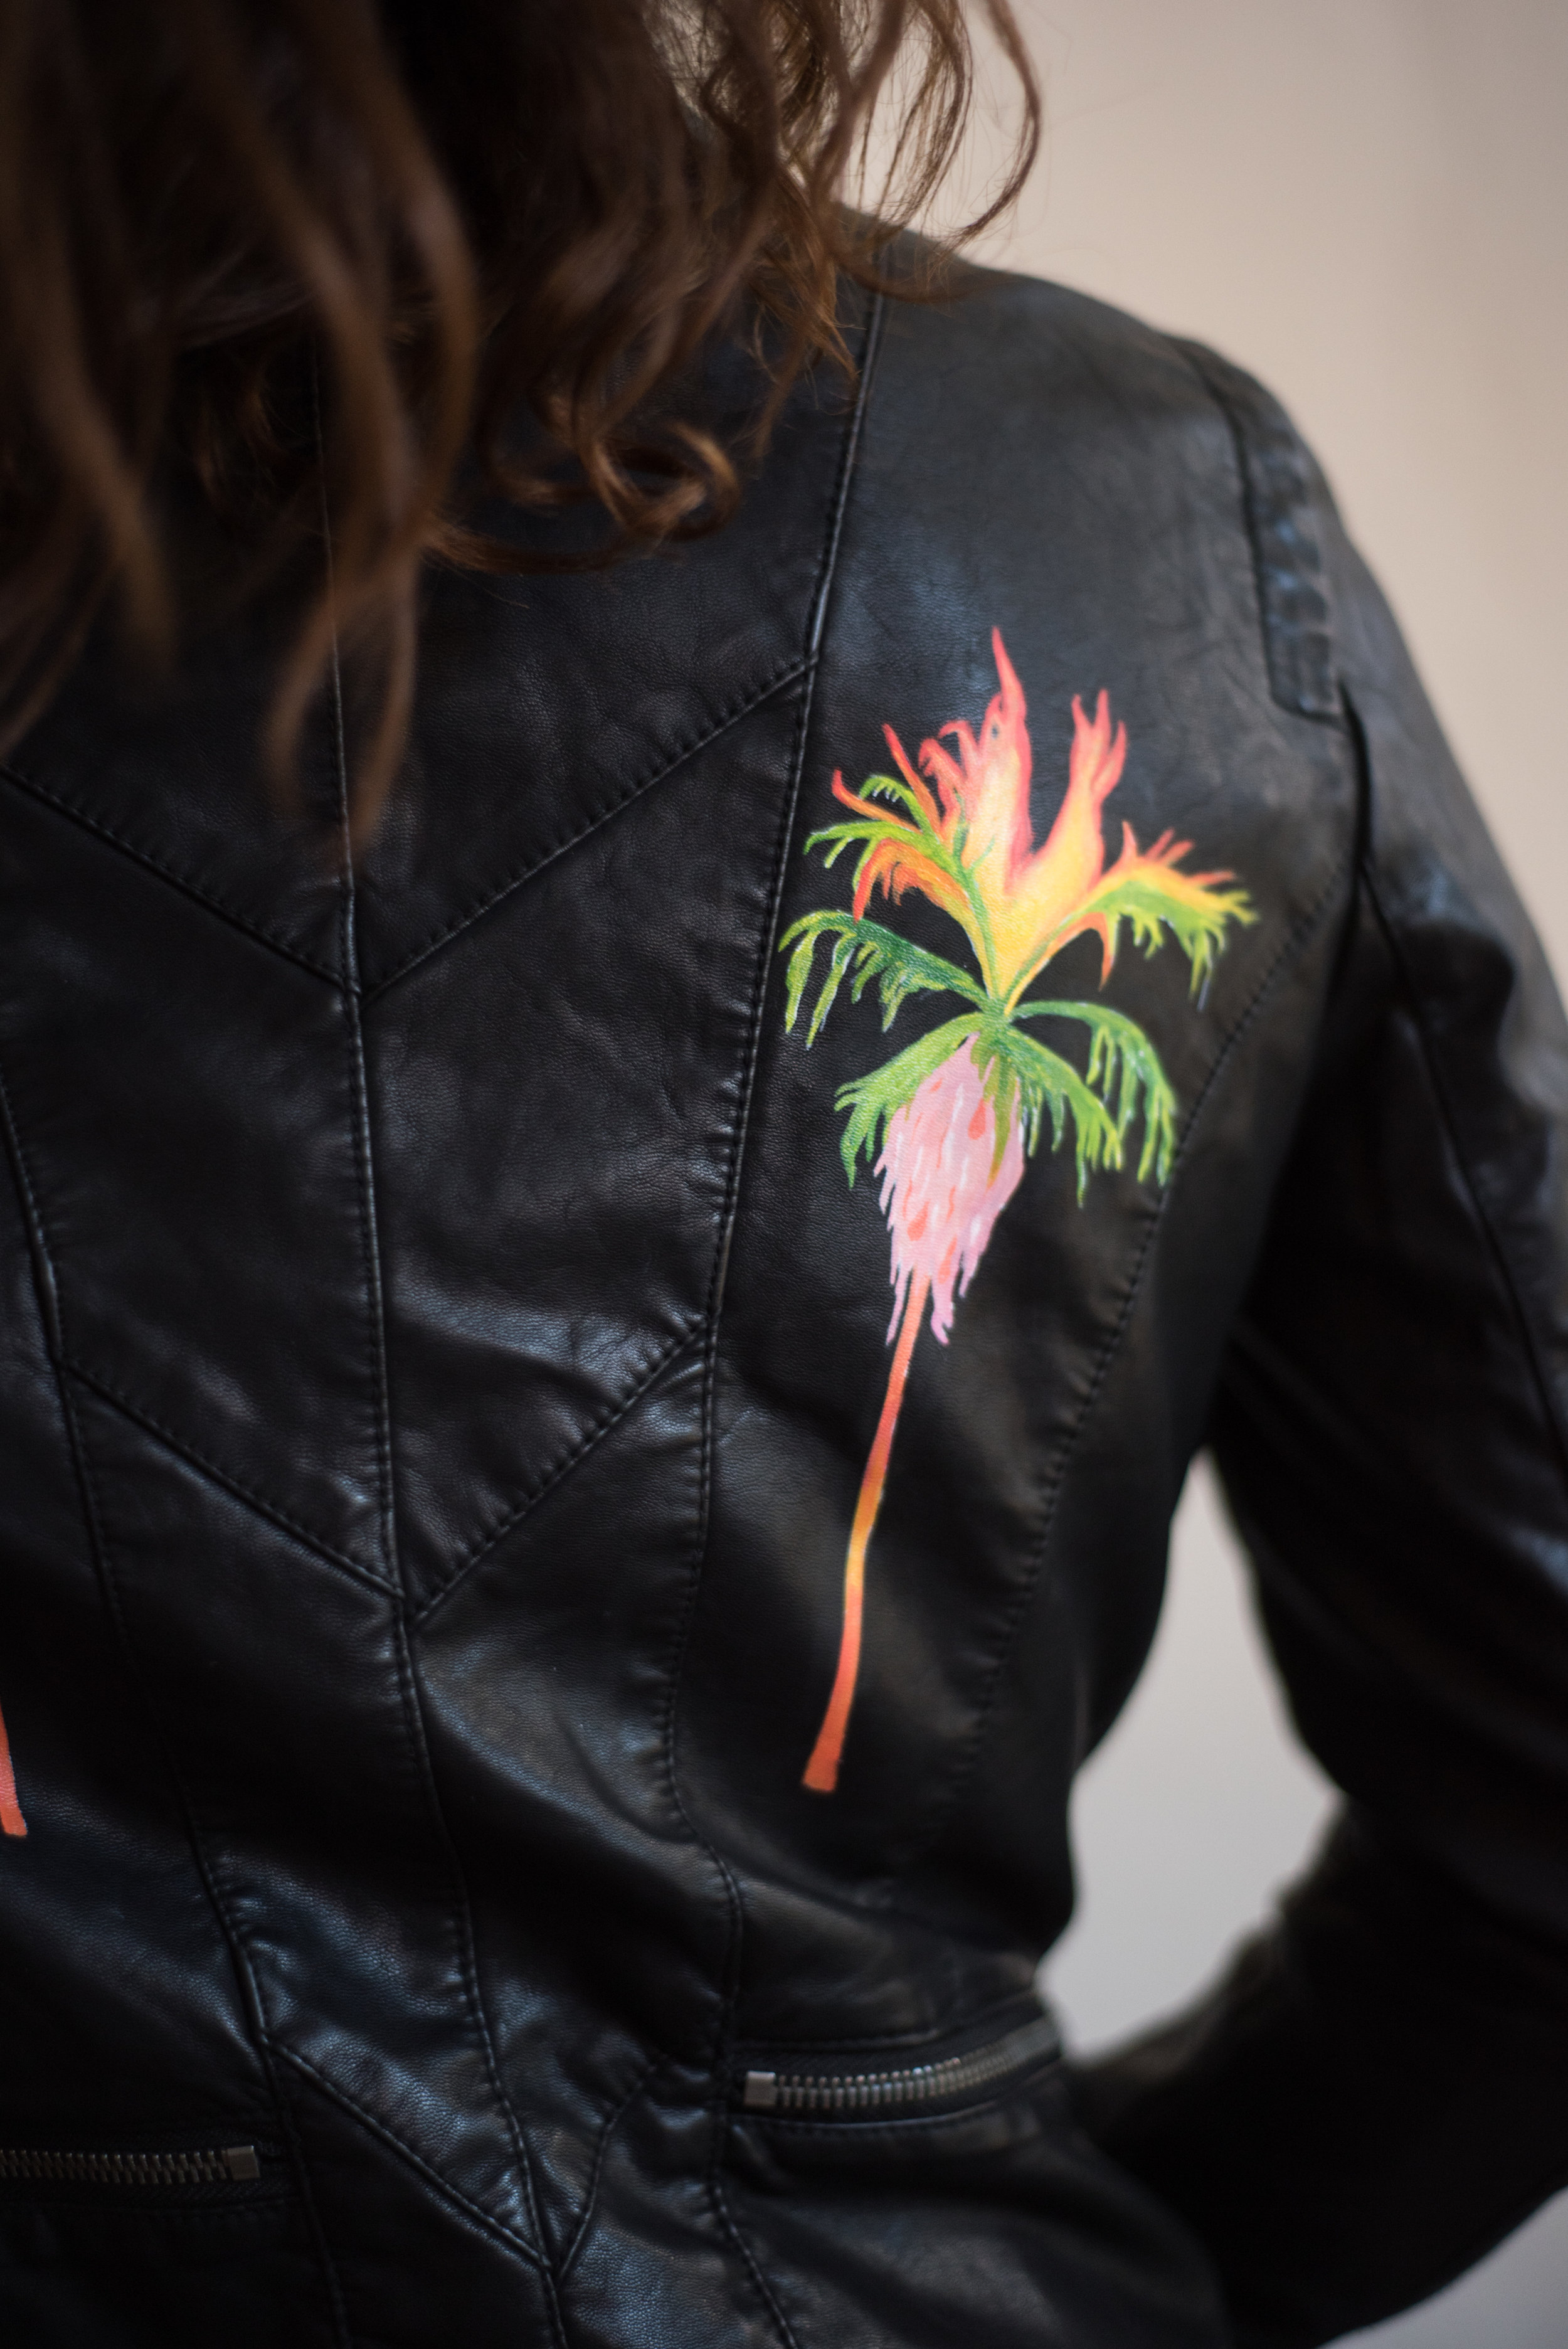 jbellzamy.com palm fire jacket 2.jpg